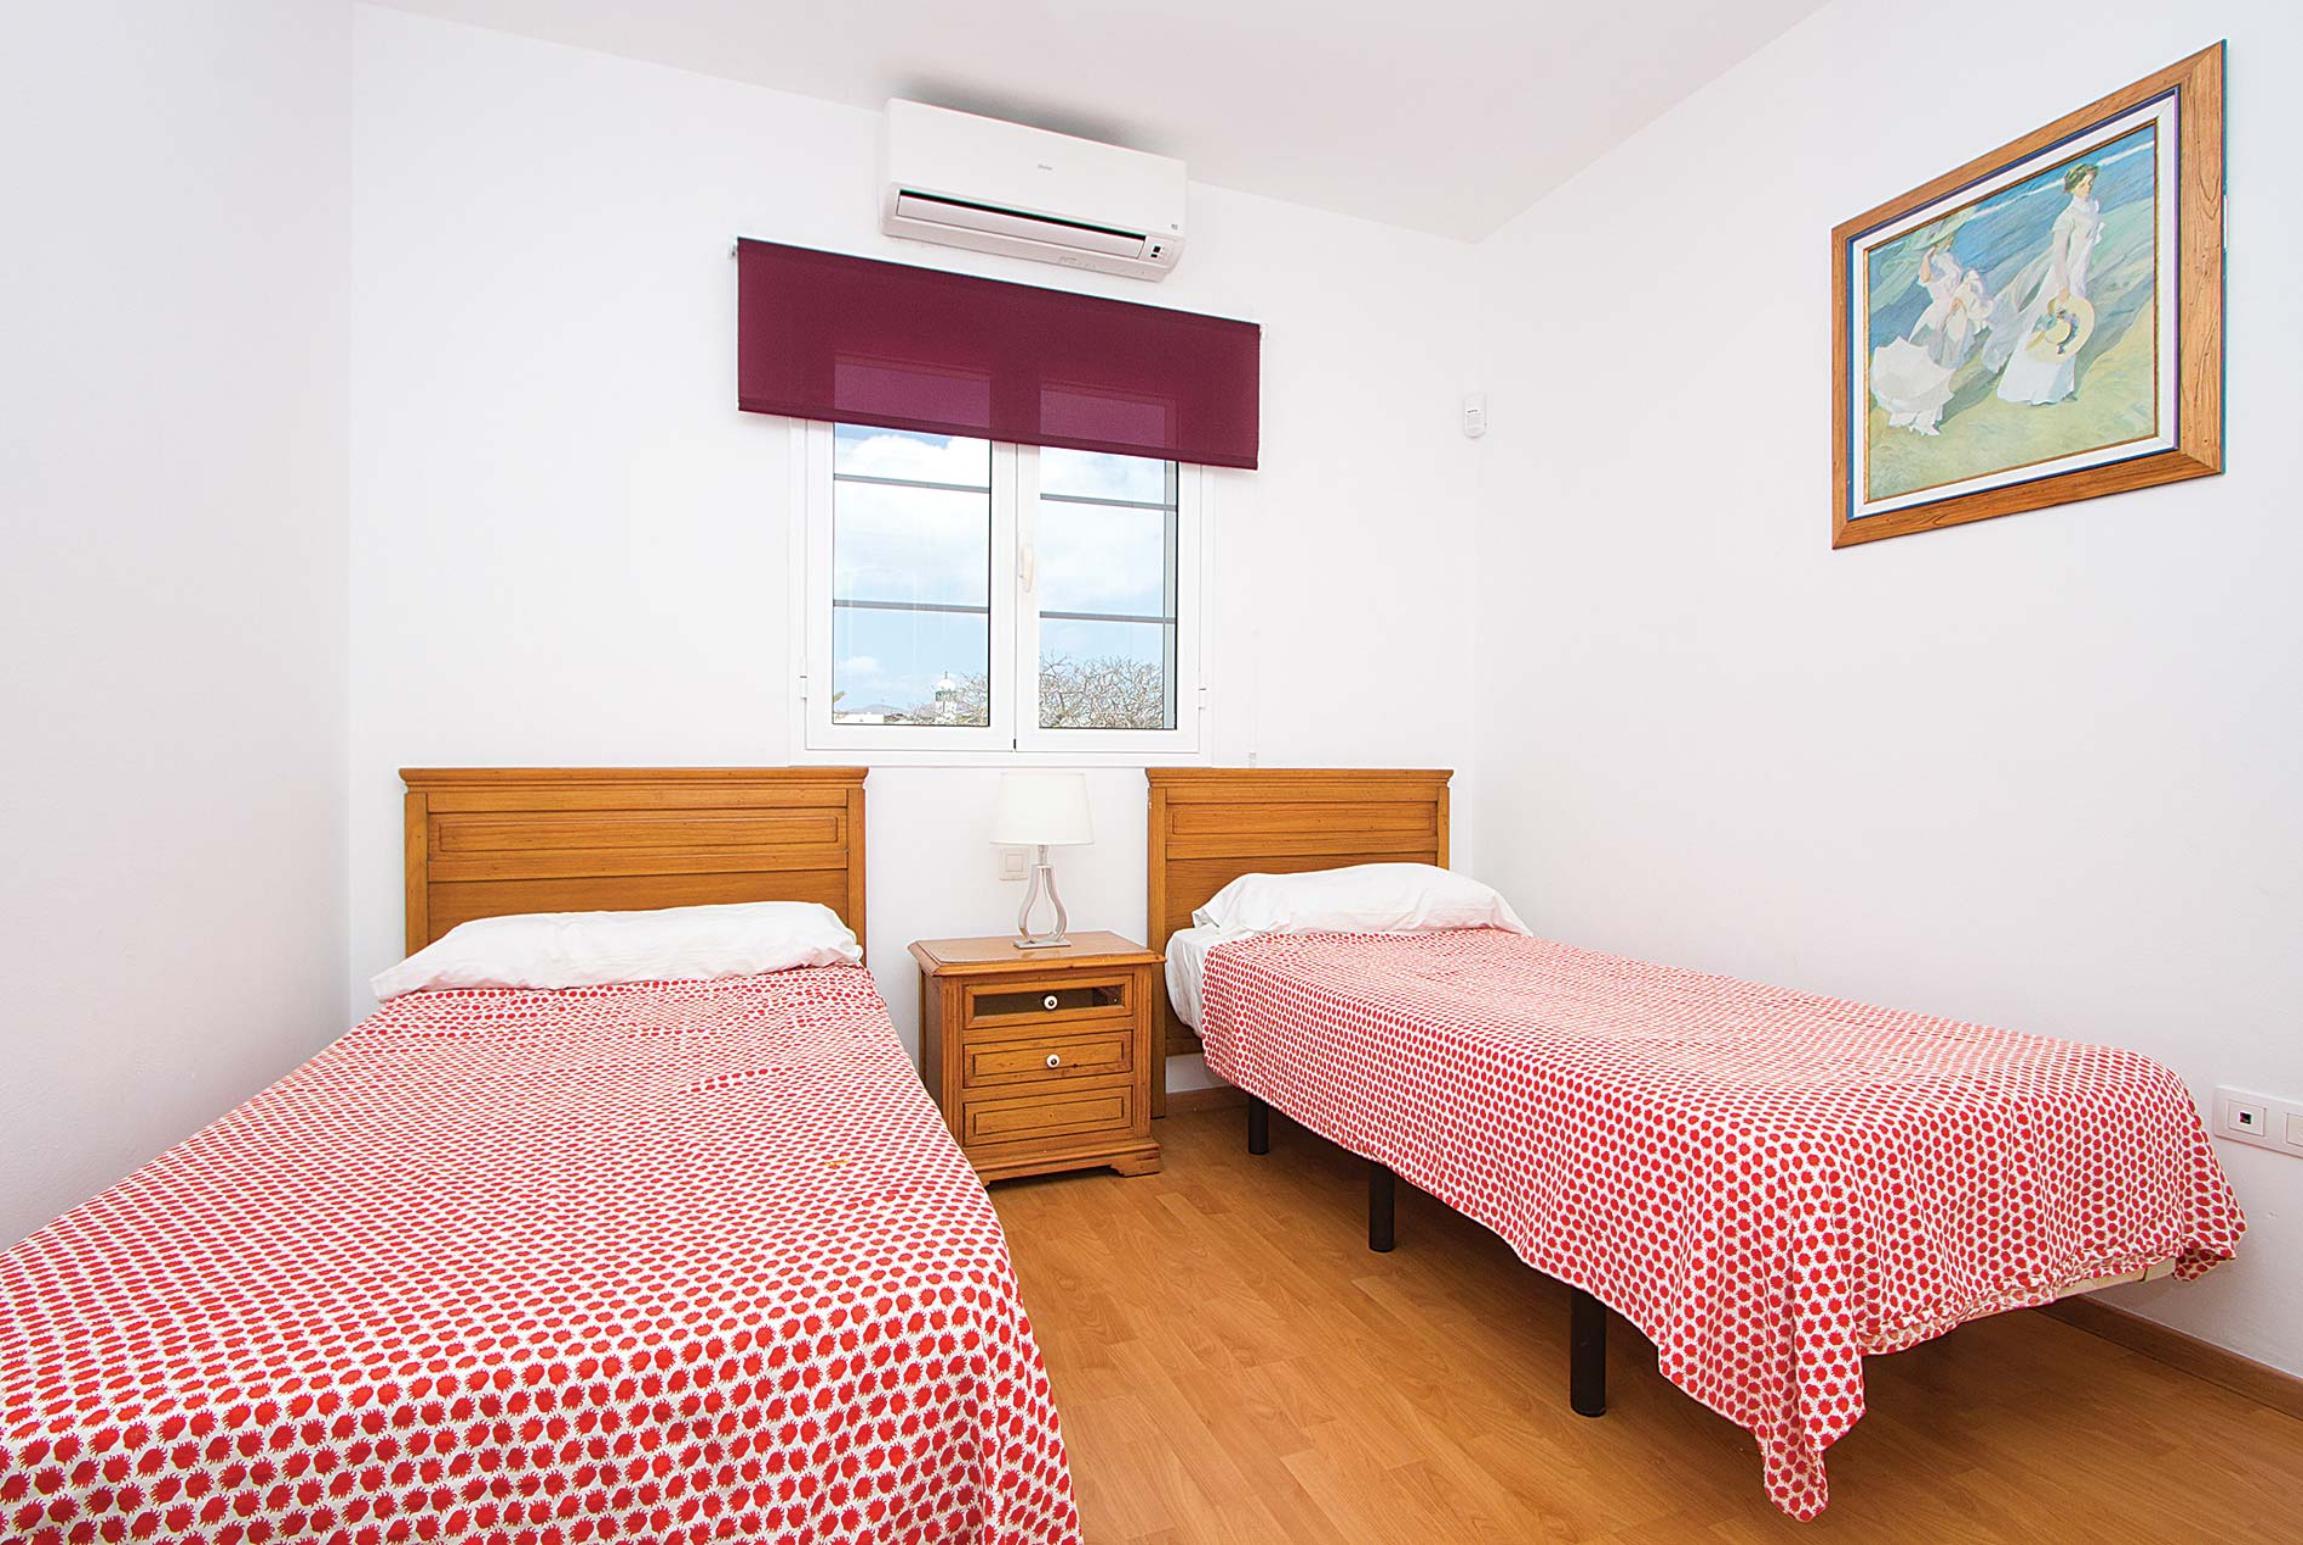 Ferienhaus Tania (2654356), Puerto del Carmen, Lanzarote, Kanarische Inseln, Spanien, Bild 11